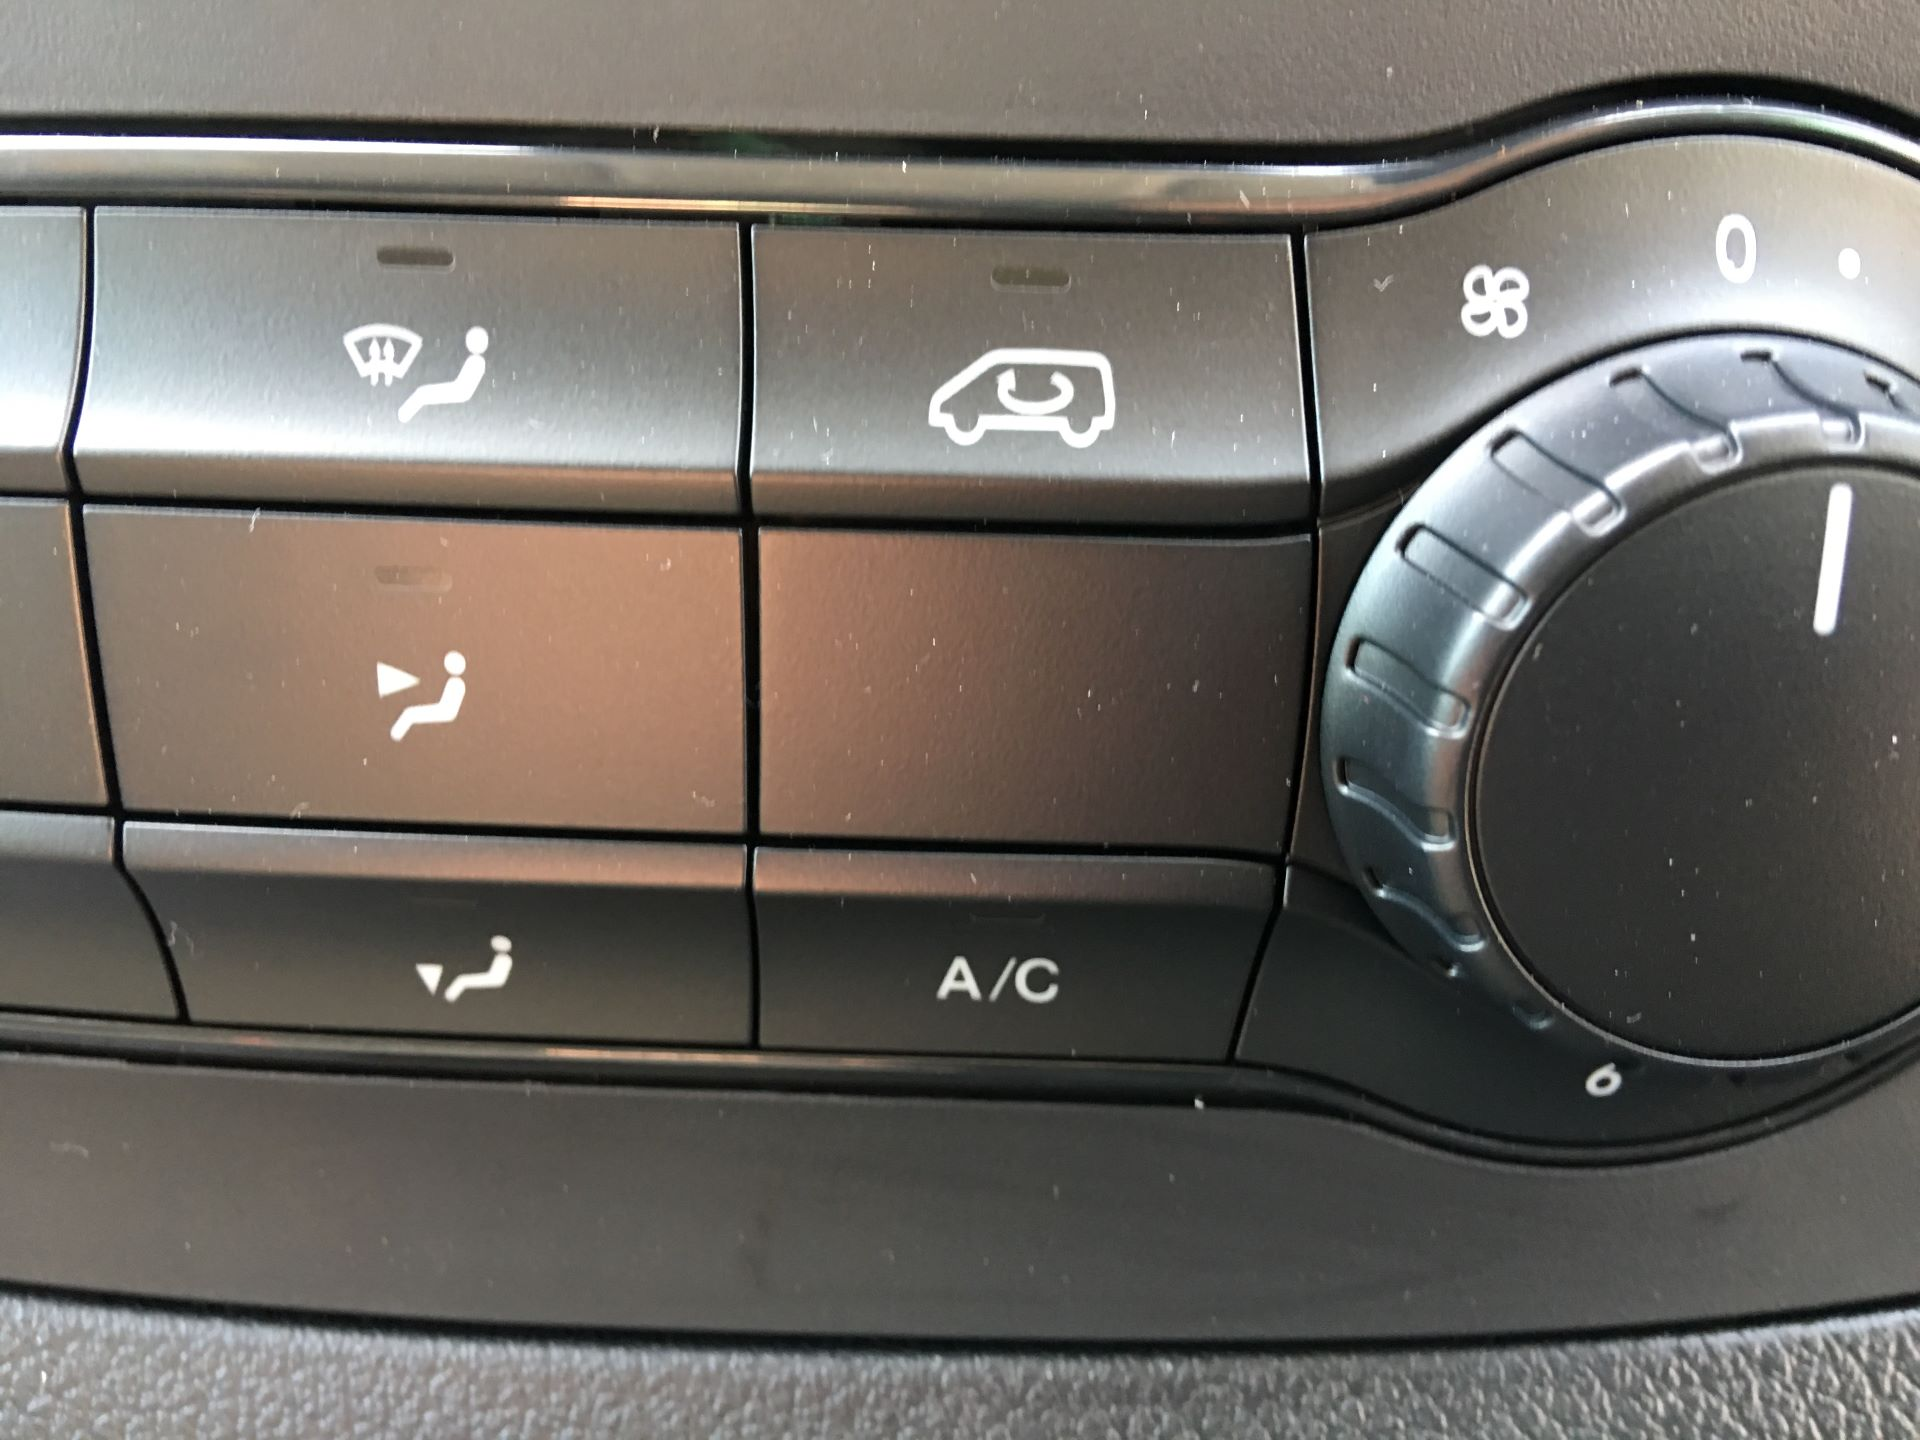 2019 Mercedes-Benz Vito LONG 111 CDI VAN EURO 5/6 (YM19HFZ) Image 9